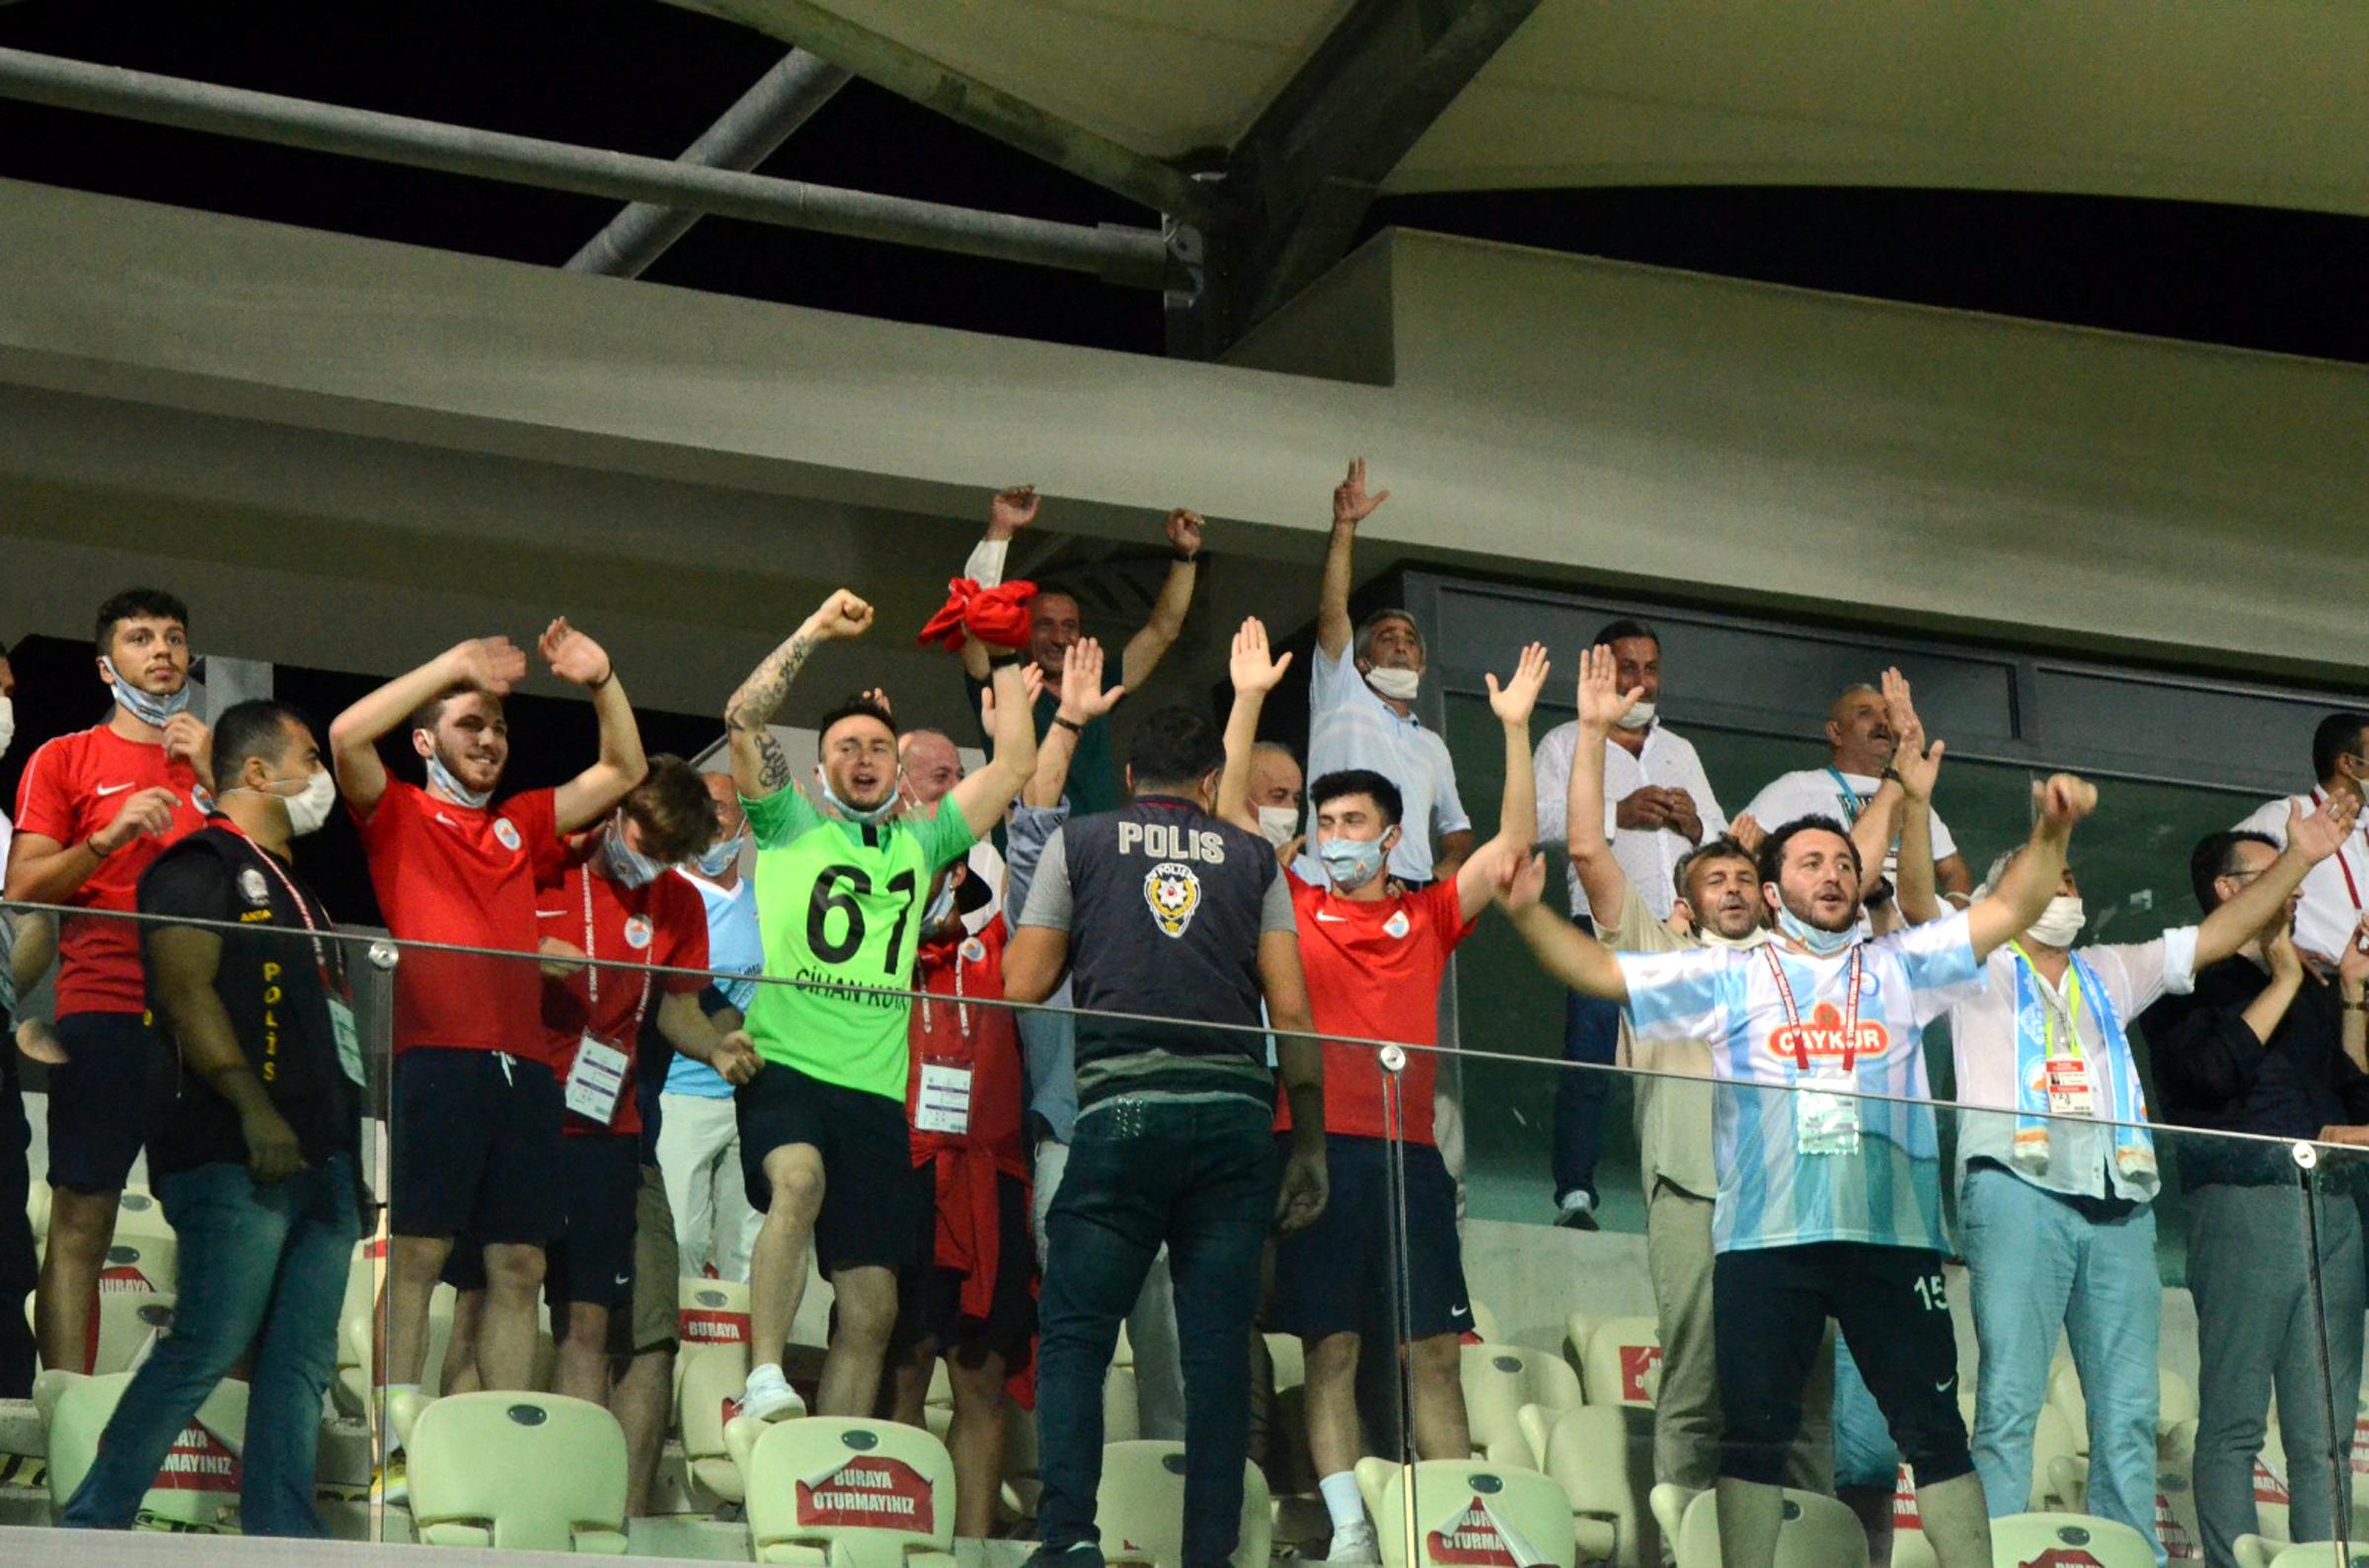 TFF 2'nci Lig'e yükselen son takım Pazarspor oldu